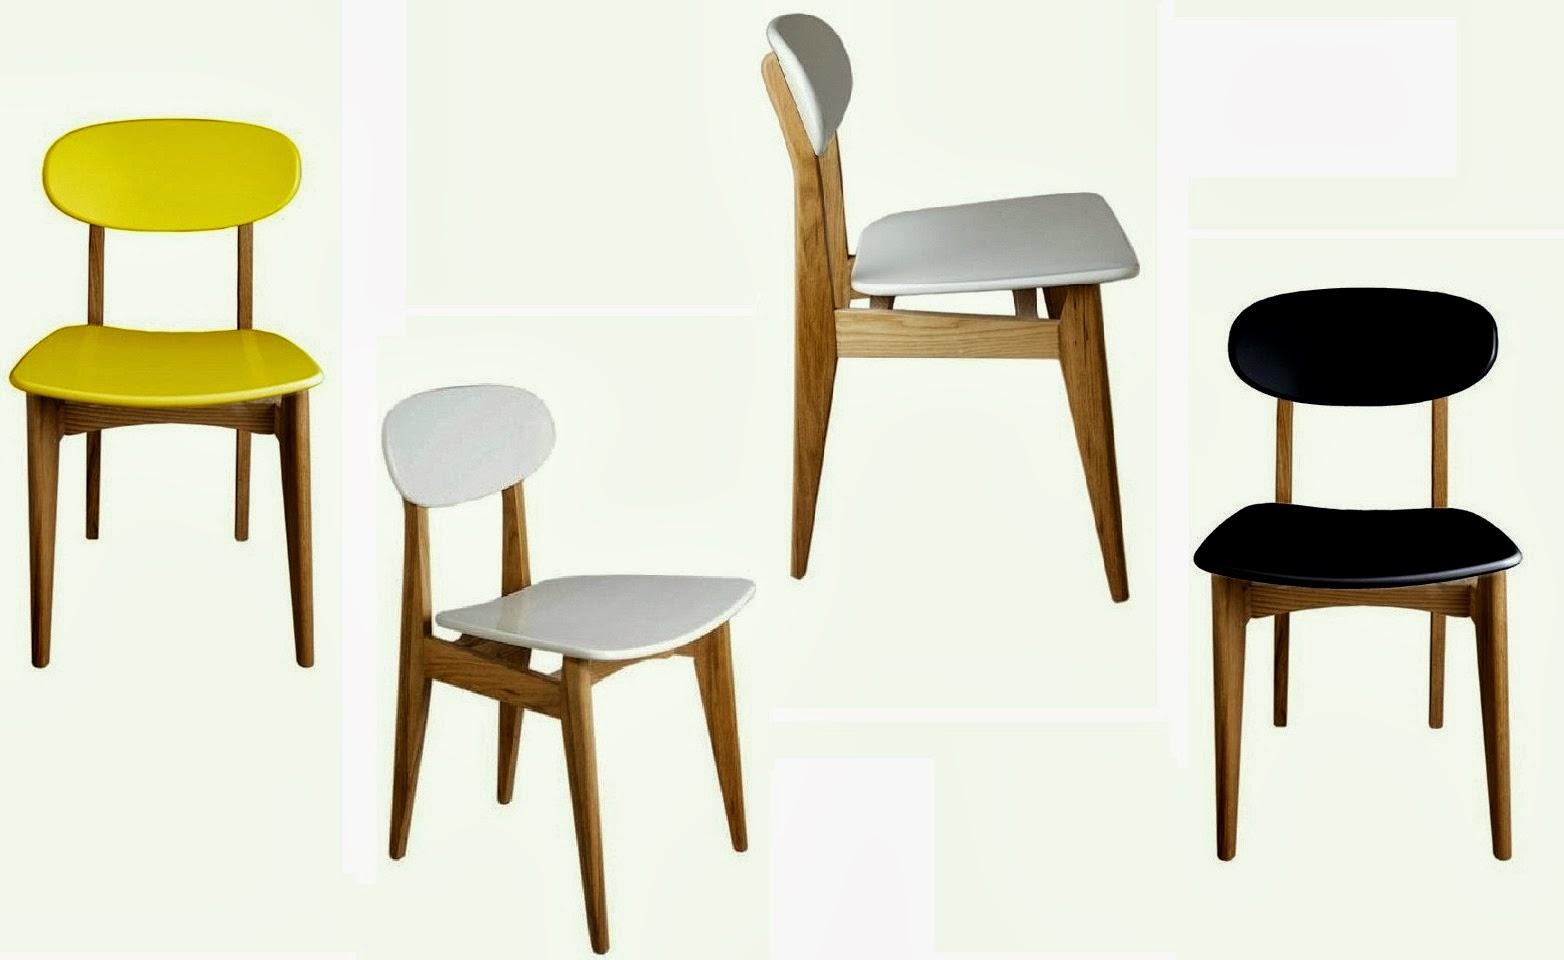 art utile robert sentou chaise de roger landault. Black Bedroom Furniture Sets. Home Design Ideas